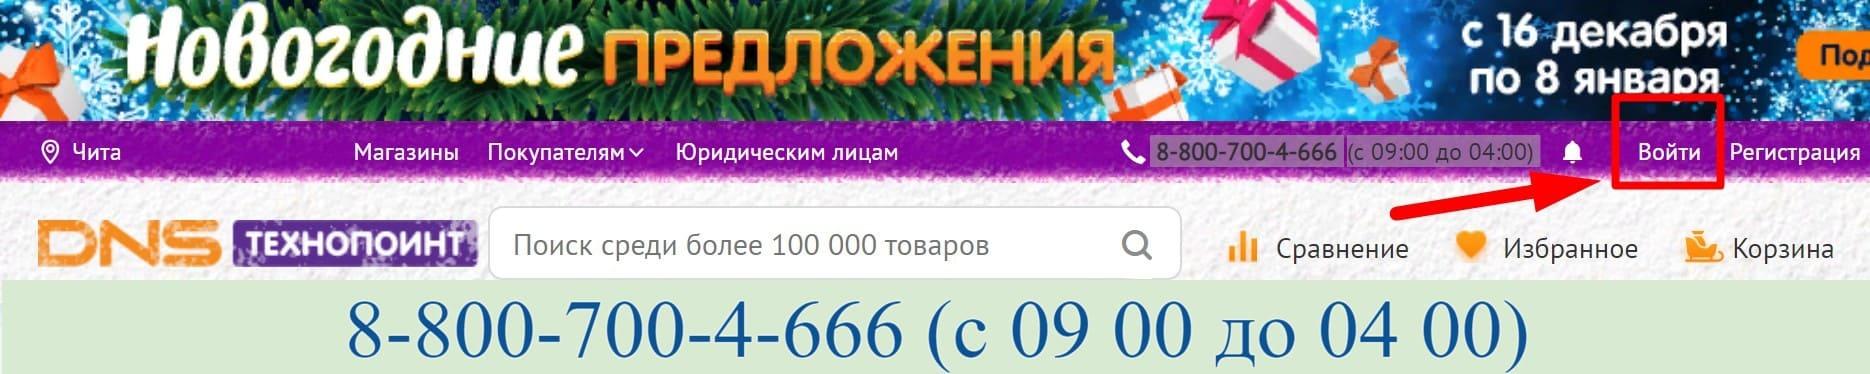 Технопоинт сайт интернет магазина